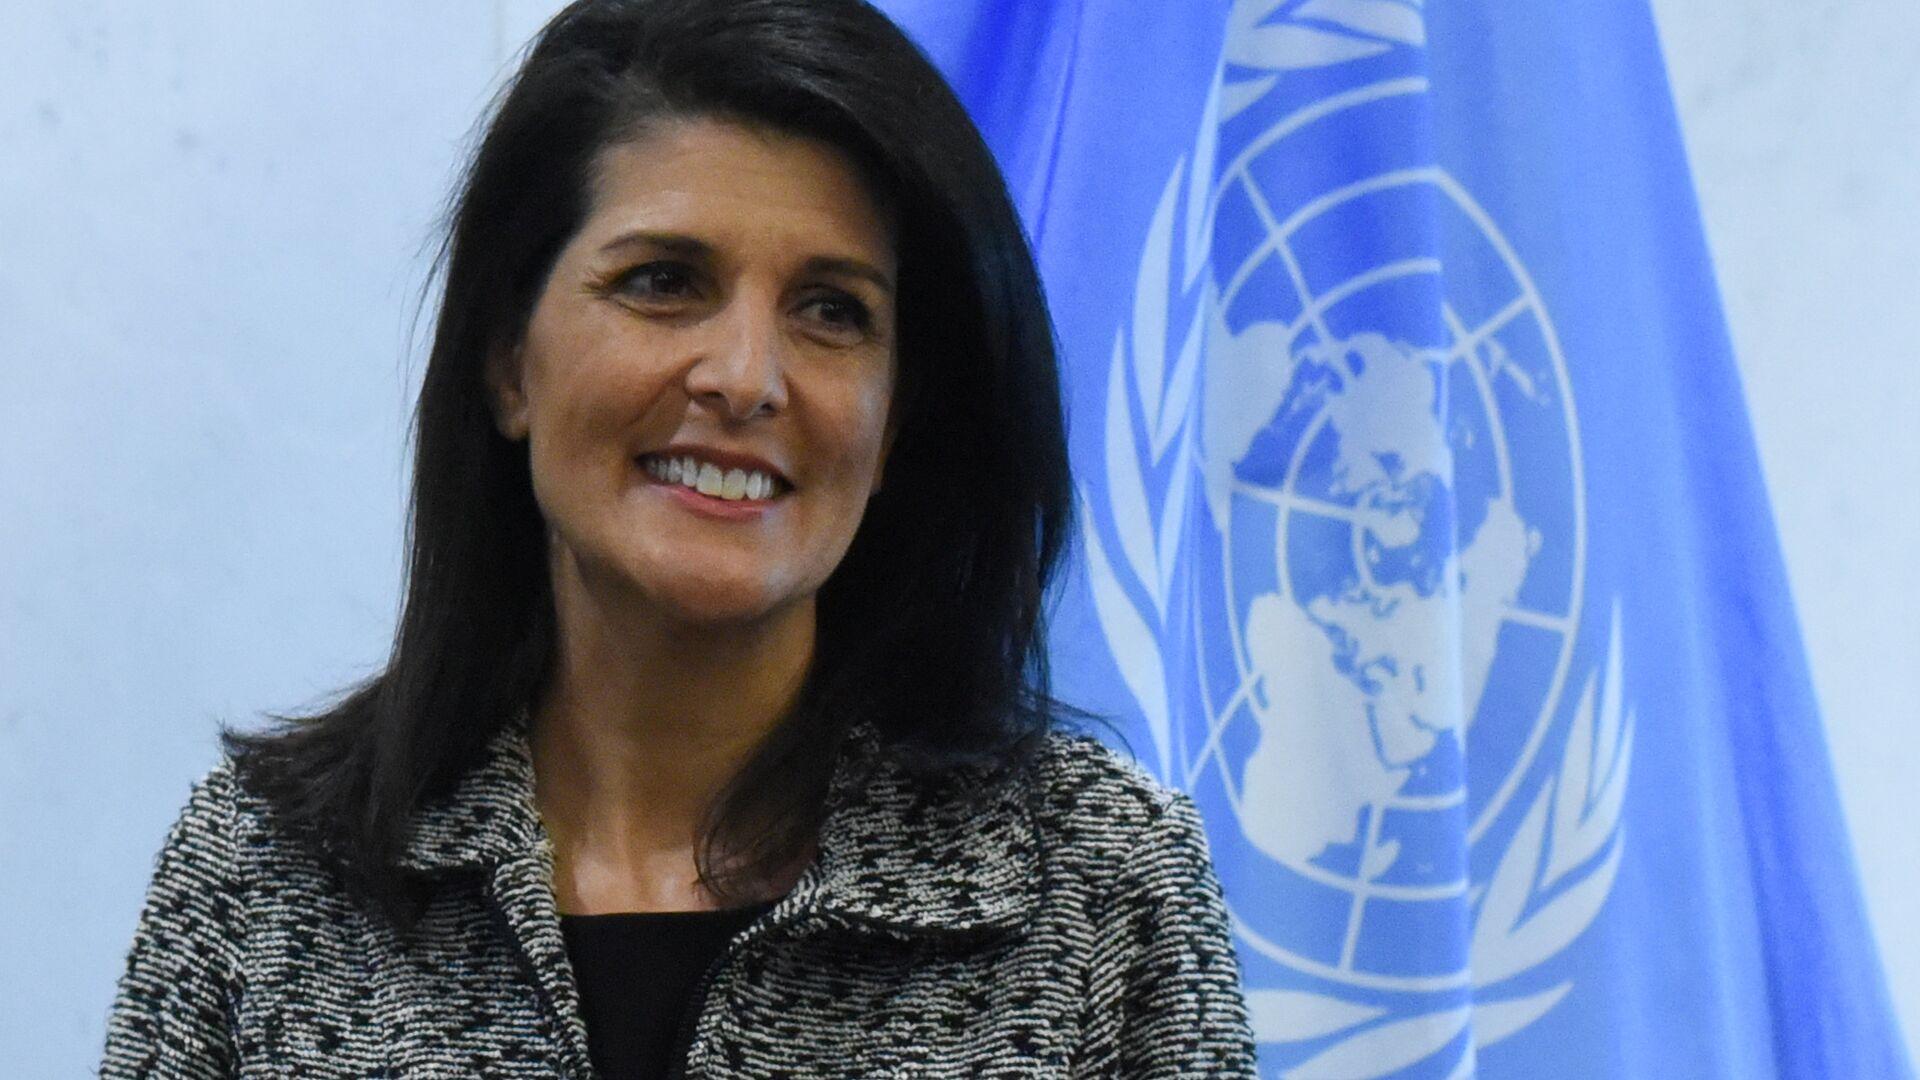 Rappresentante permanente USA all'ONU Nikki Haley - Sputnik Italia, 1920, 17.06.2021